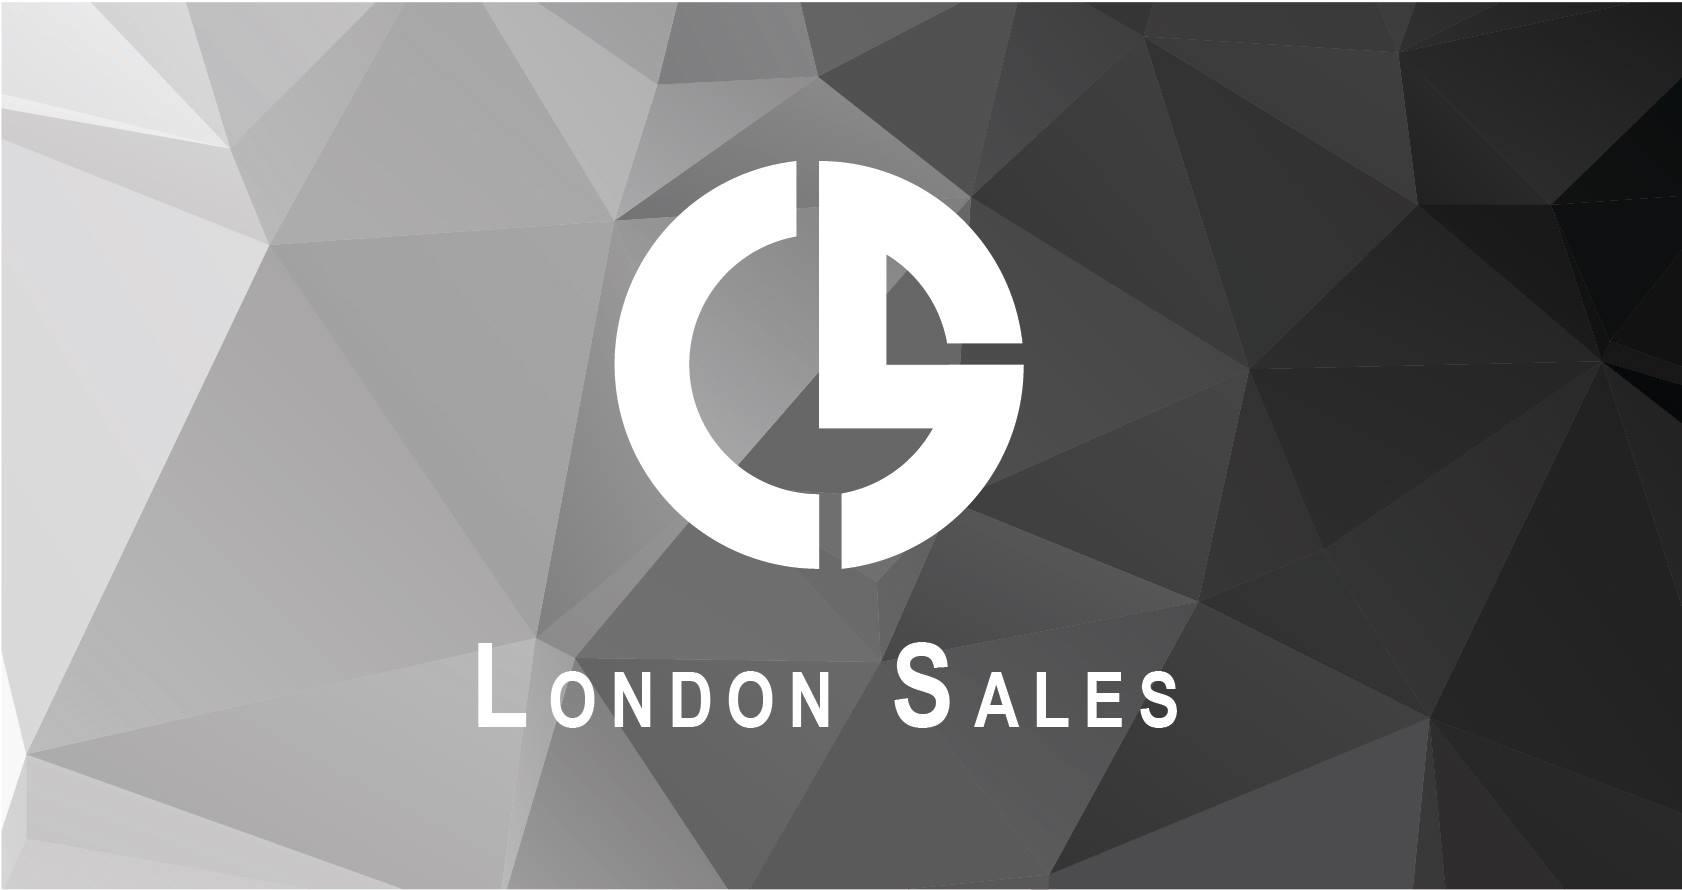 London Sales Corporation